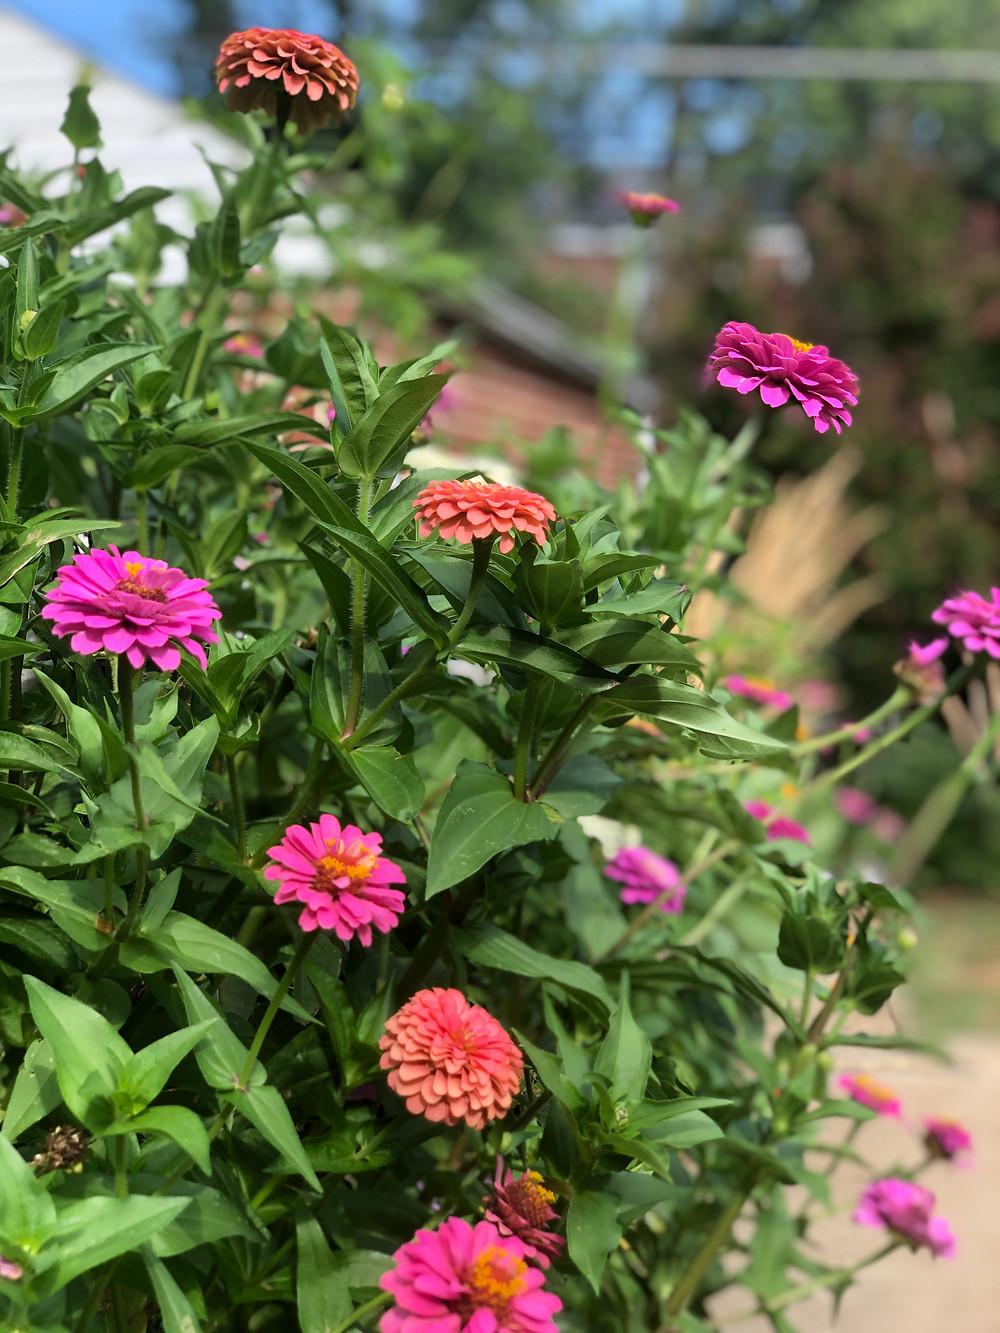 zinnias in bloom